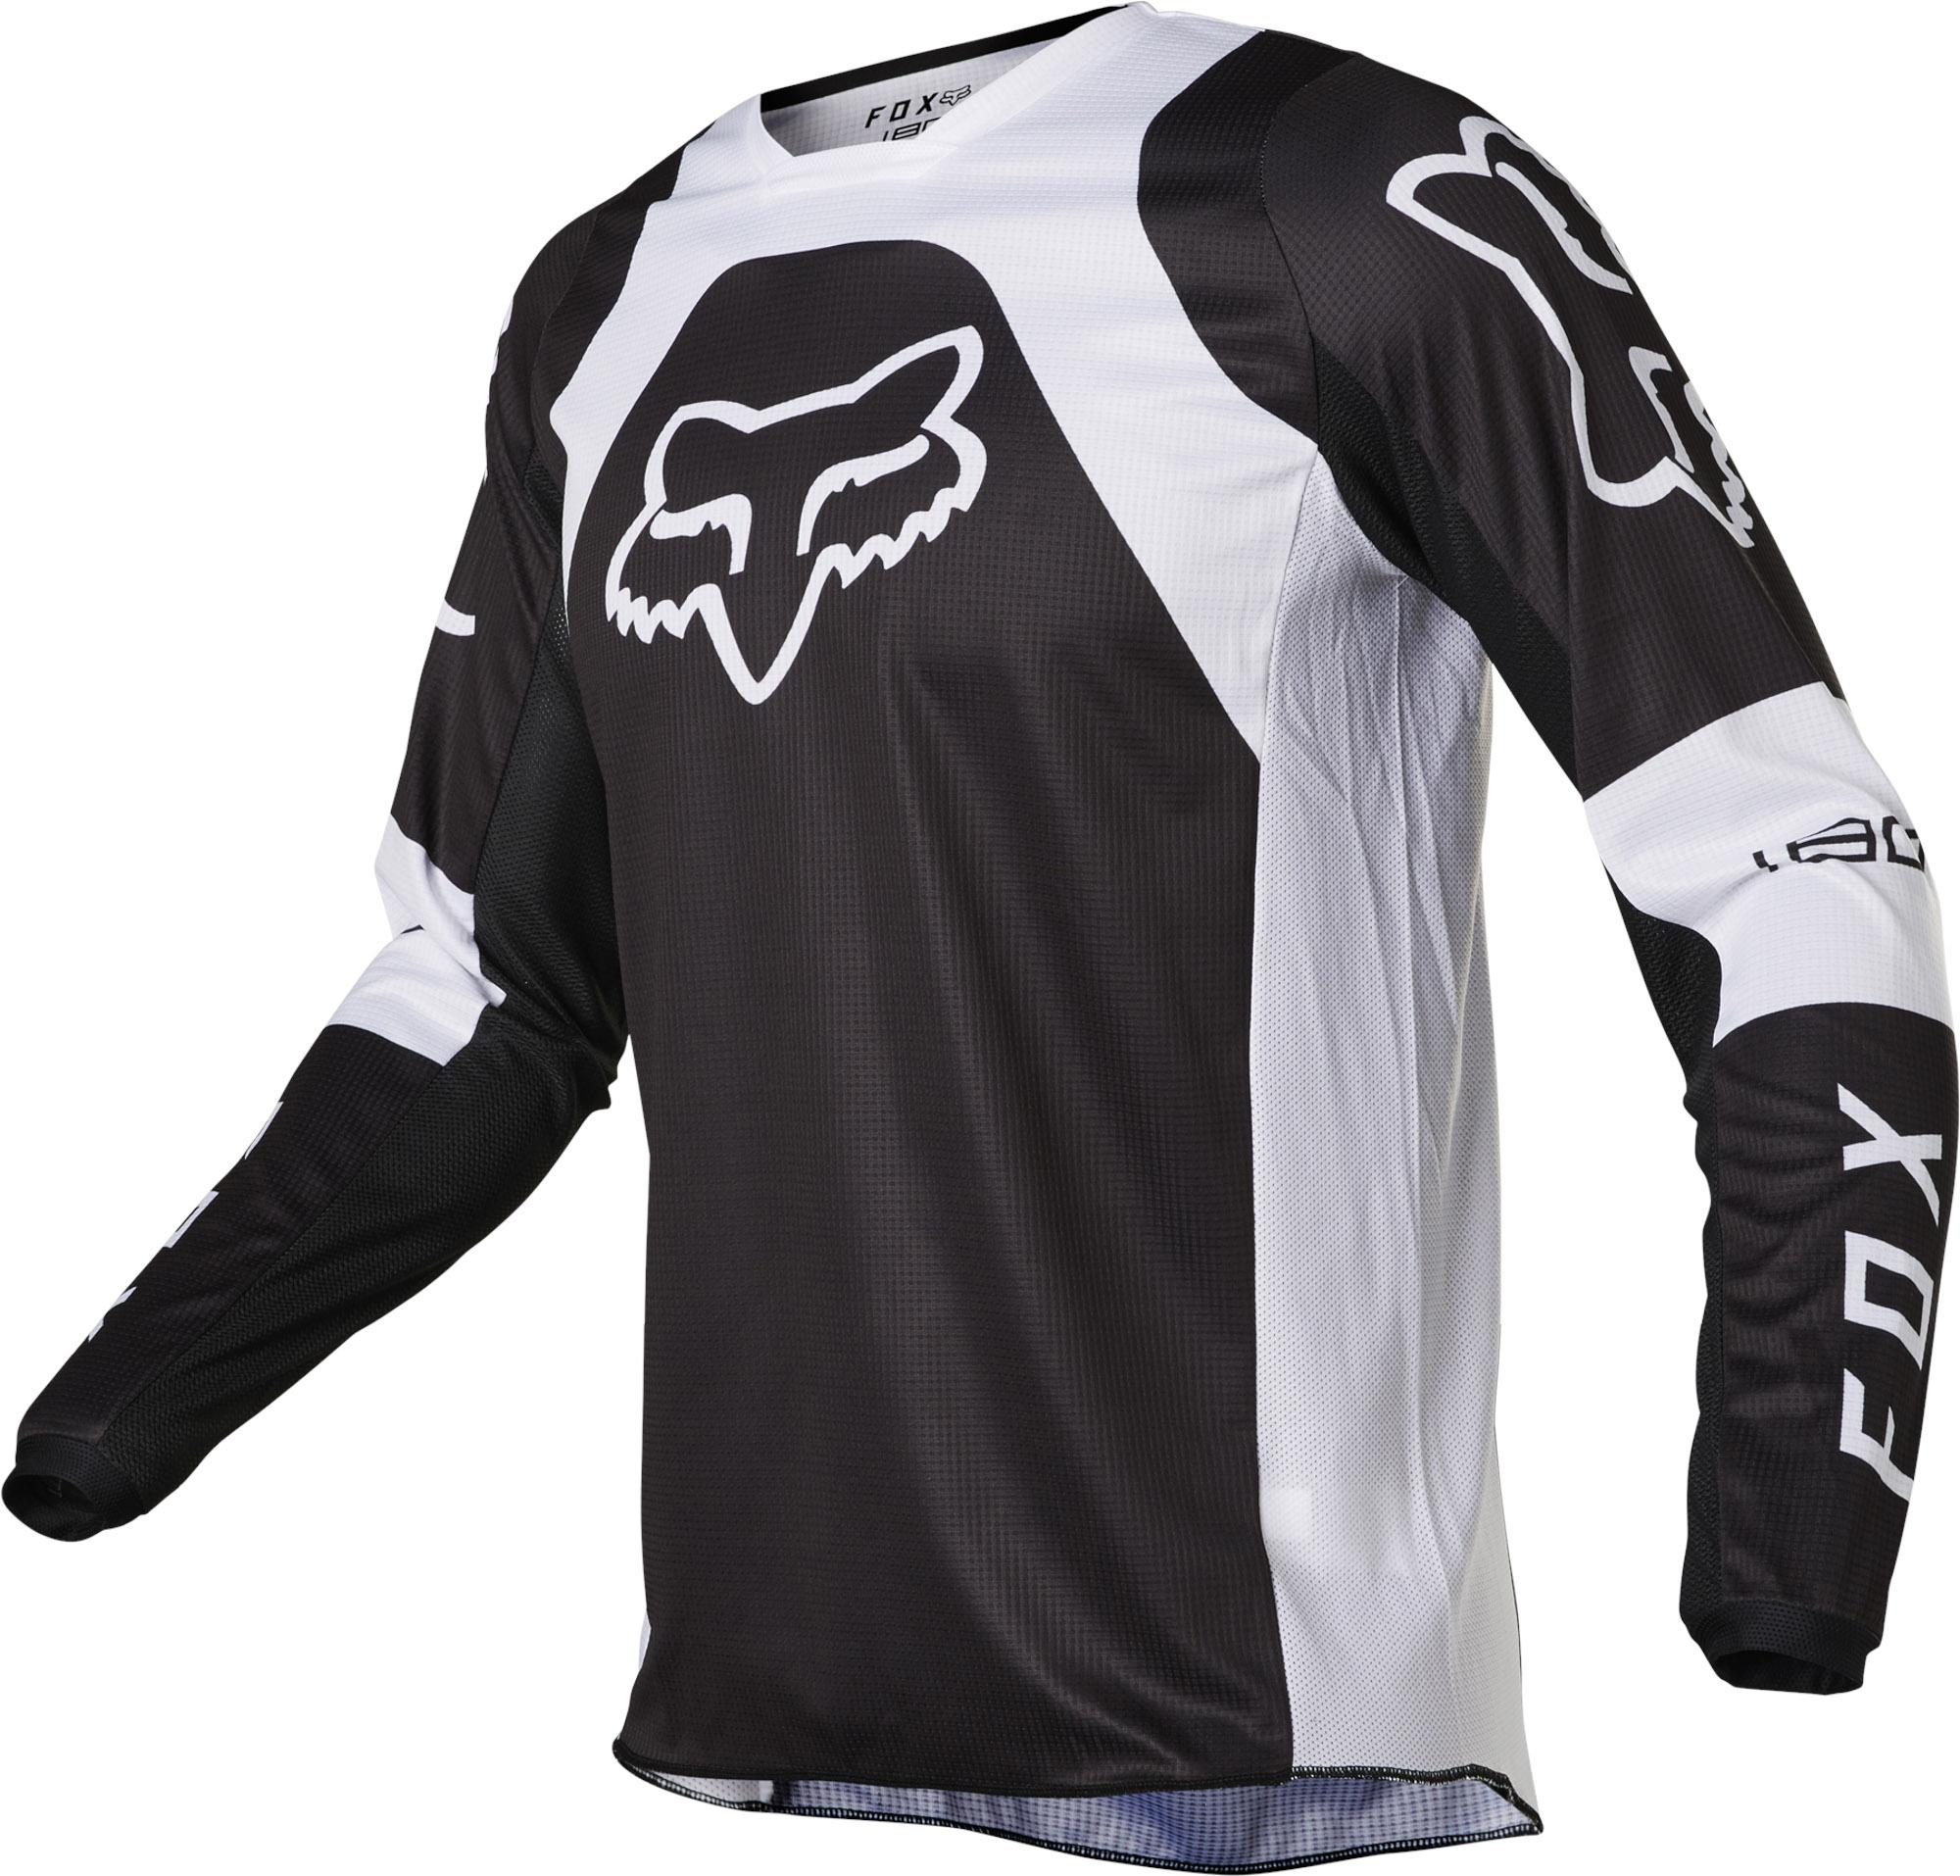 FOX 180 Lux Jersey - Black/white MX22